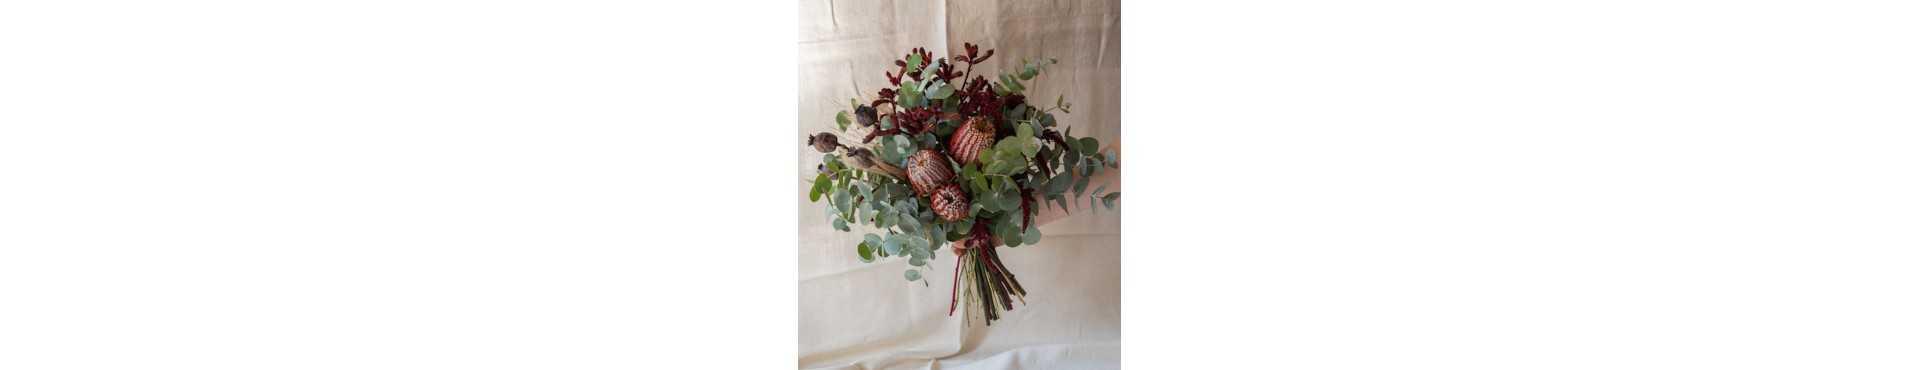 ▷ Comprar Ramos de flores silvestres online | Bahay BCN